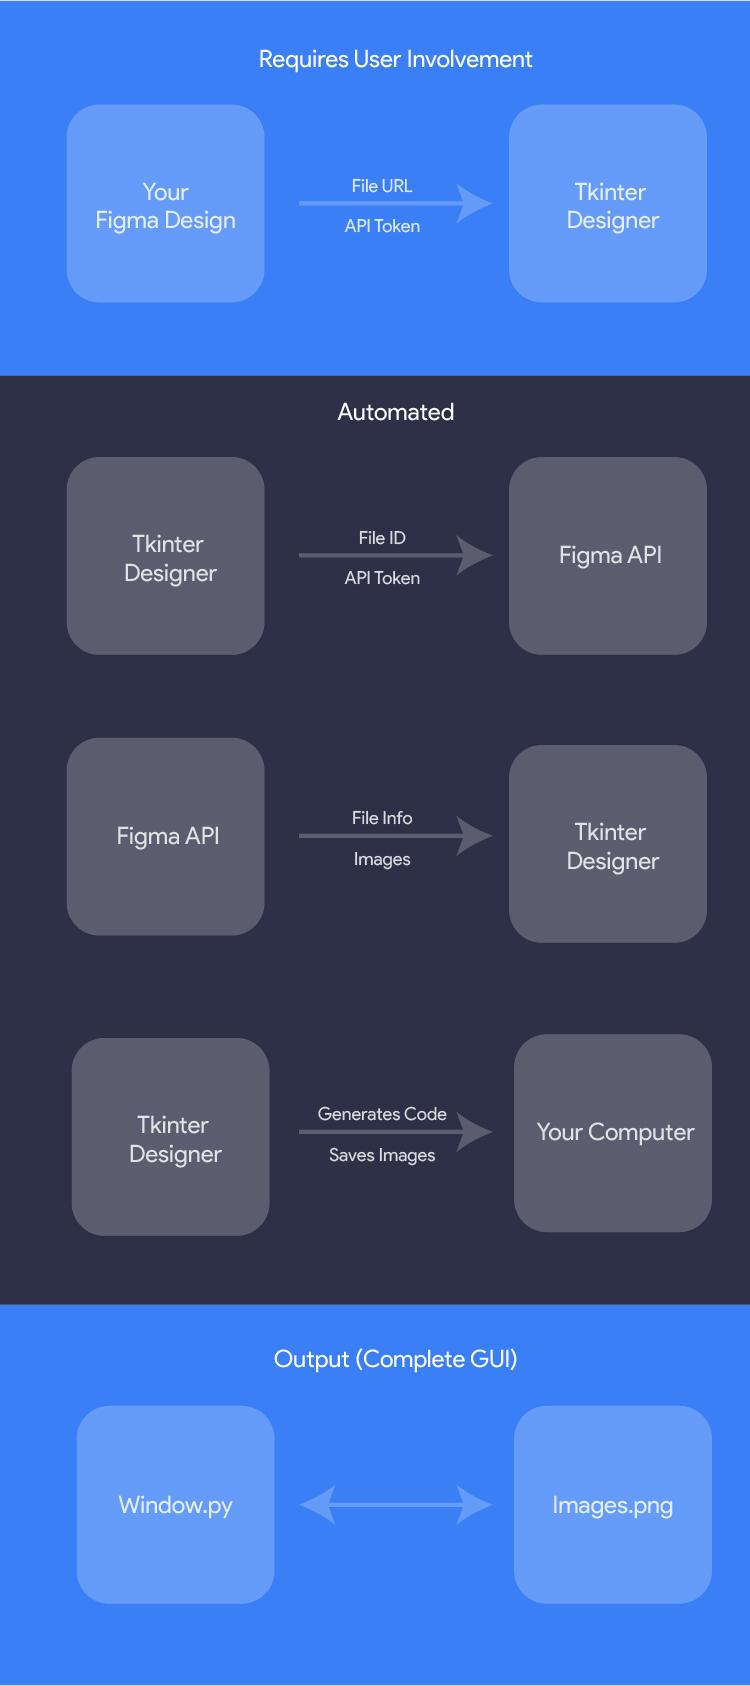 Tkinter designer process flow